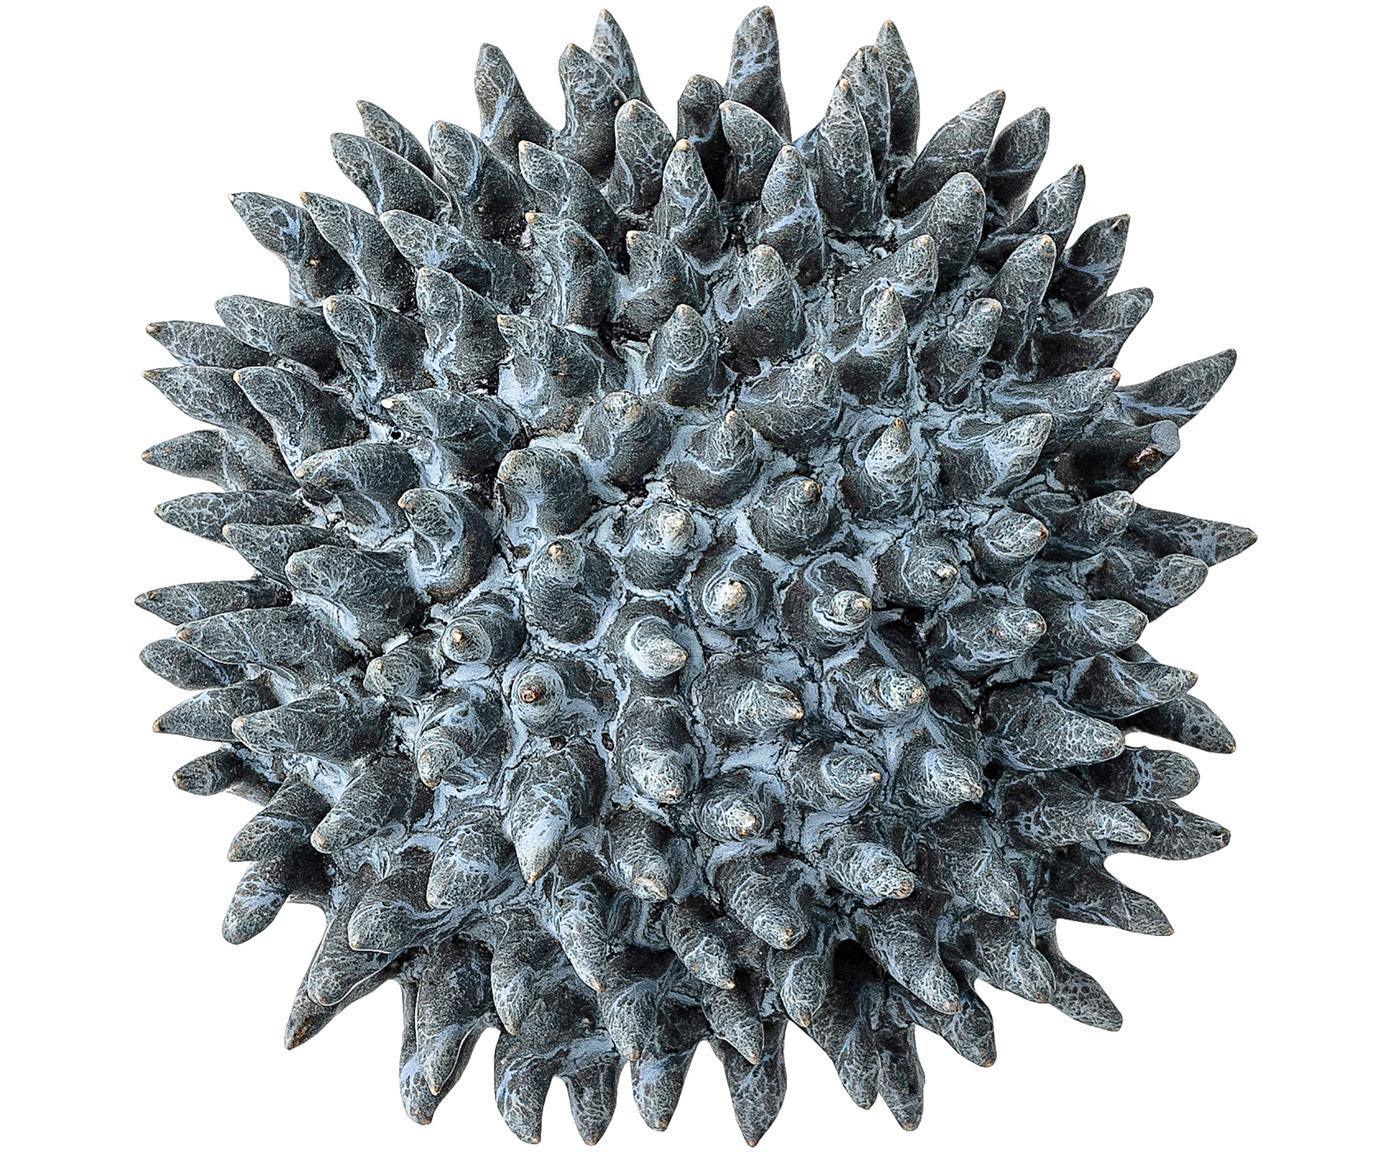 Deko-Objekt Gala, Steingut, Blau, Ø 11 cm x H 6 cm